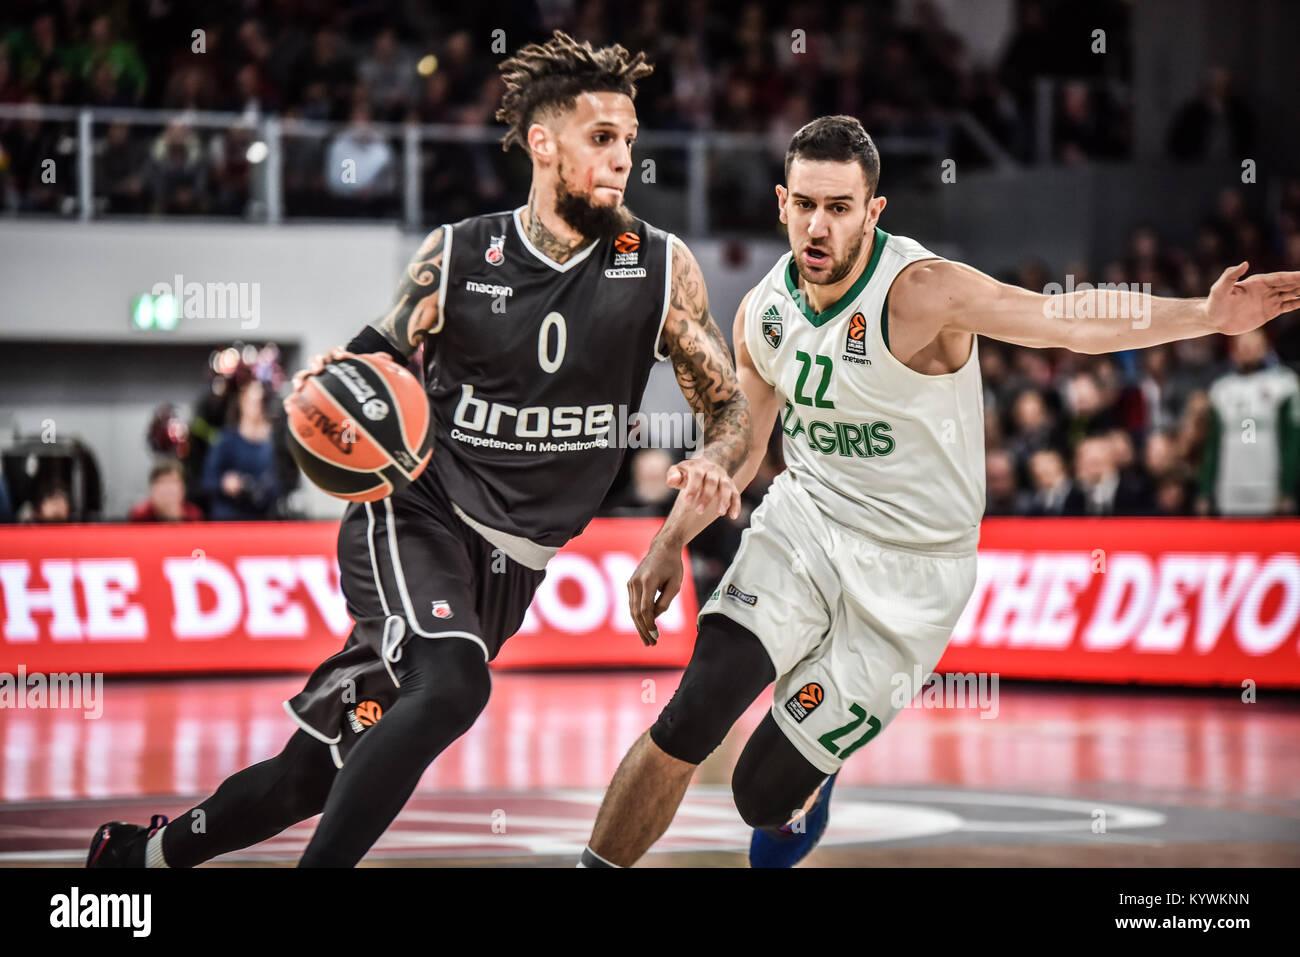 Bamberg, Germany. 16th Jan, 2018. Germany, Bamberg, Brose Arena, 16.01.2018, Basketball - Euroleague - Round 18 Stock Photo